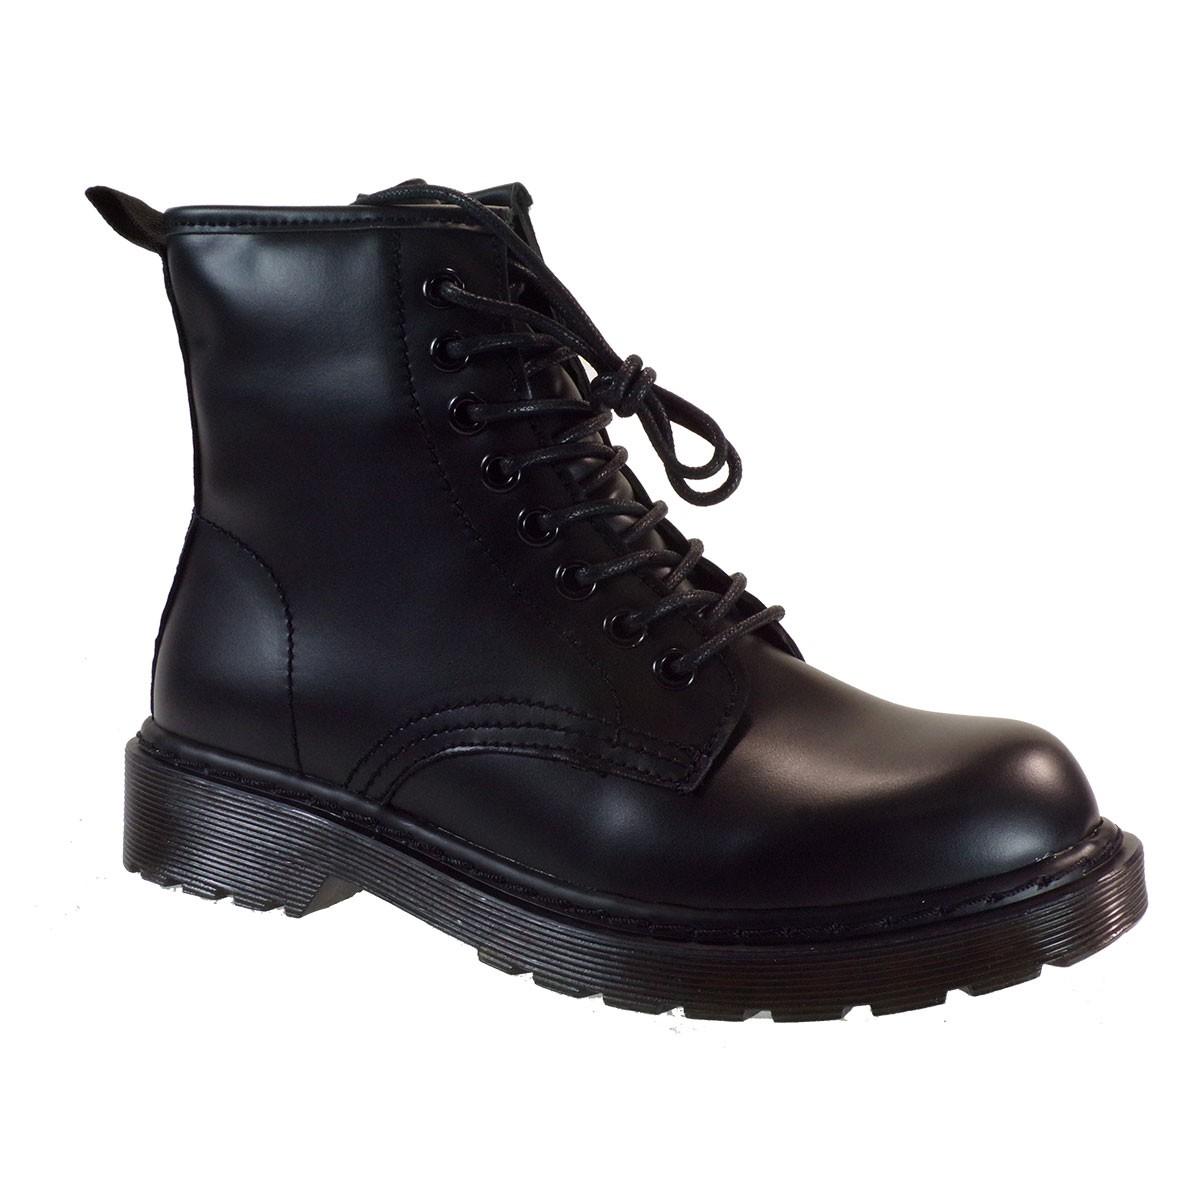 Bagiota Shoes Γυναικεία Αρβυλάκια CH180013 Μαύρο